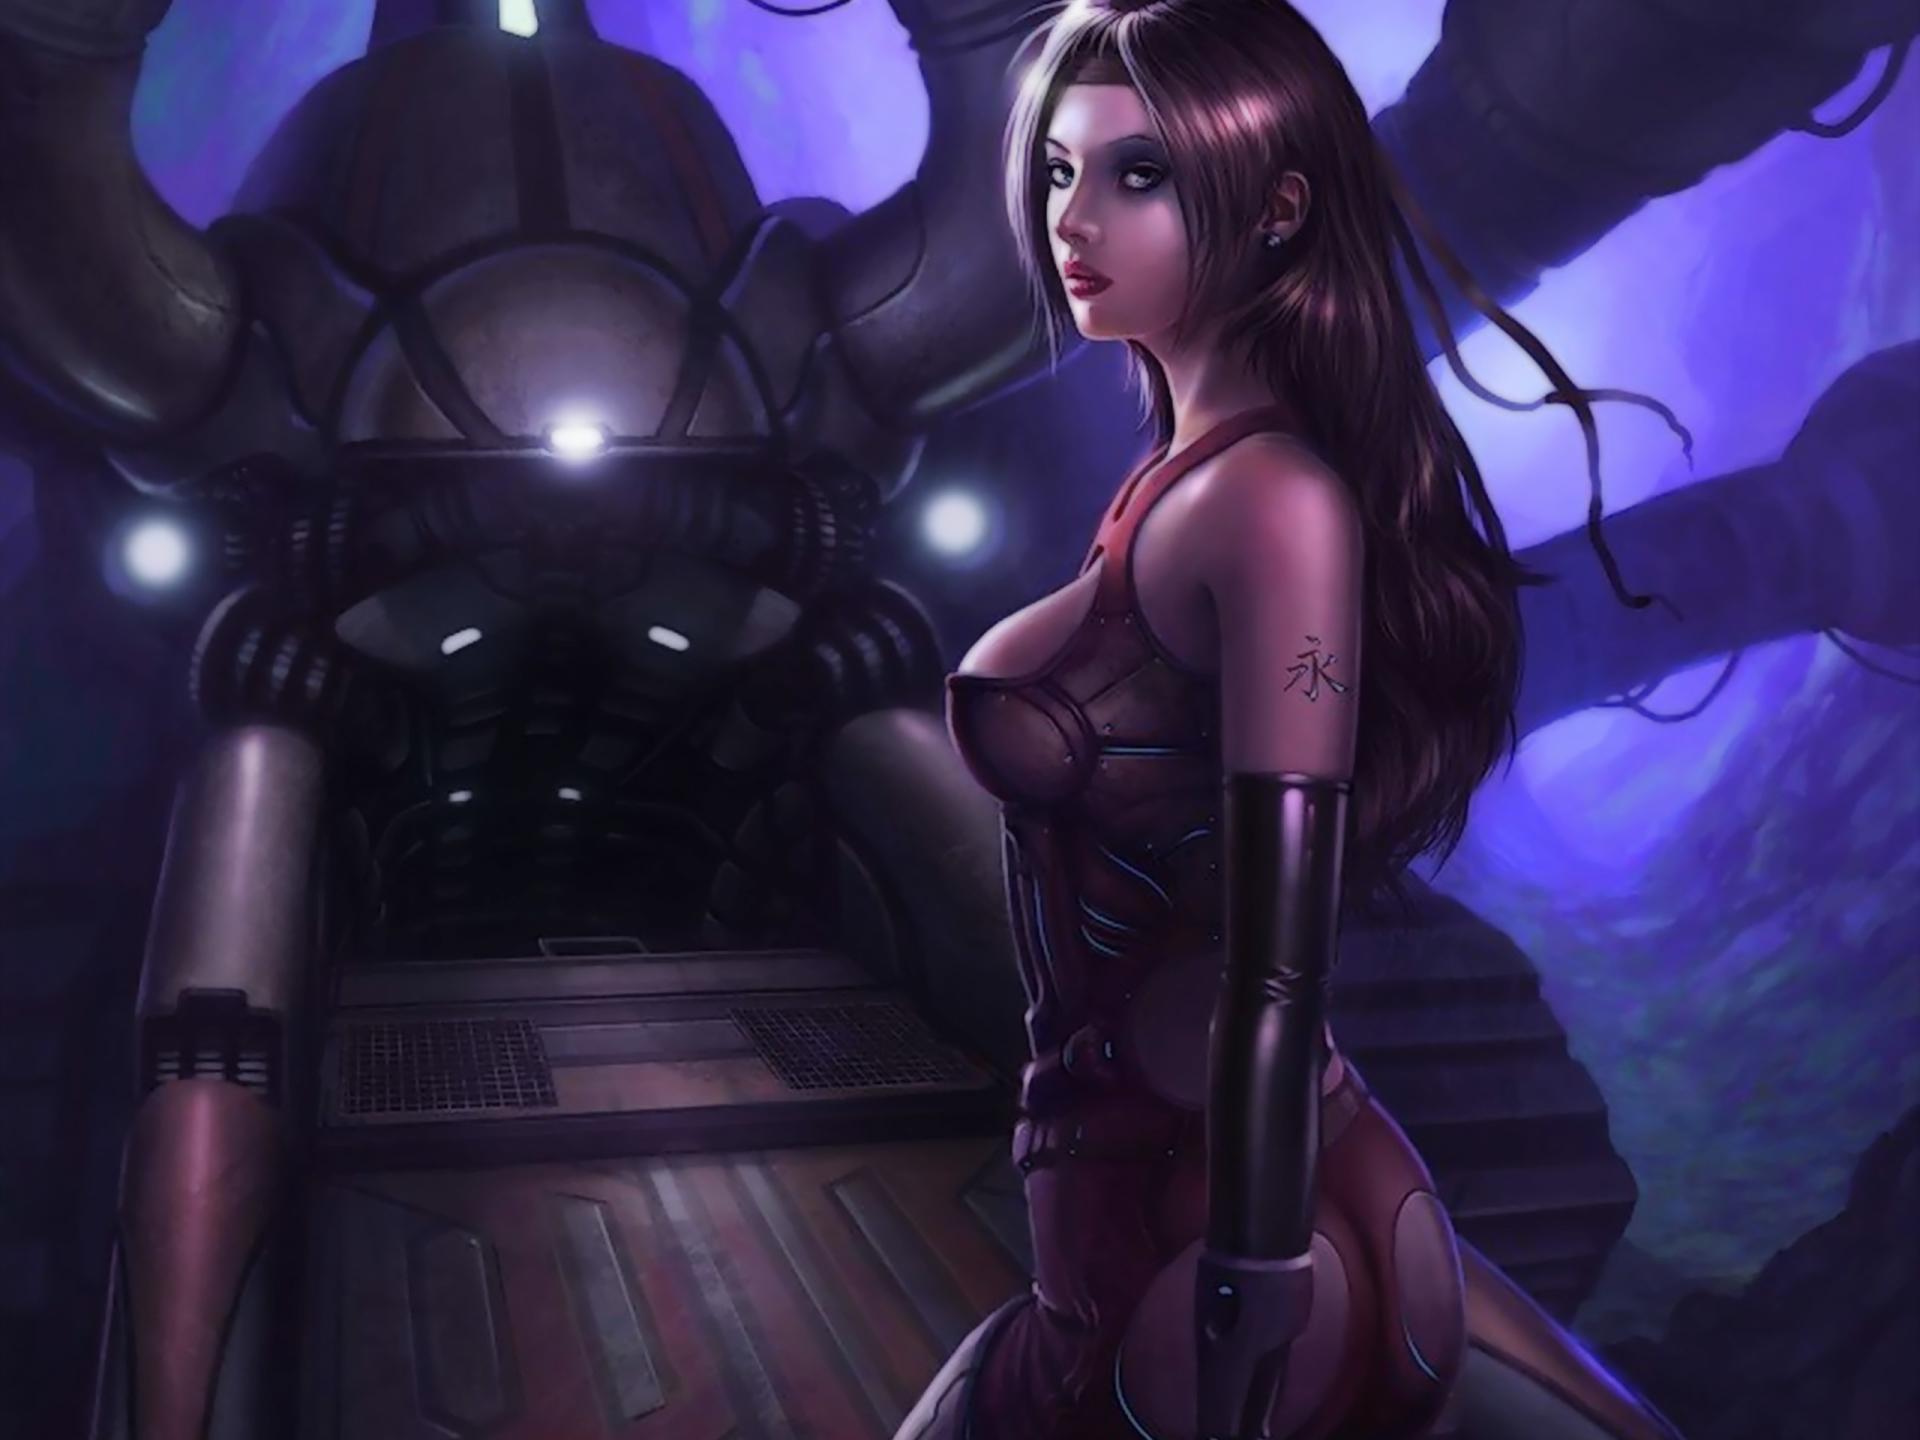 Erotic sci fi cartoons